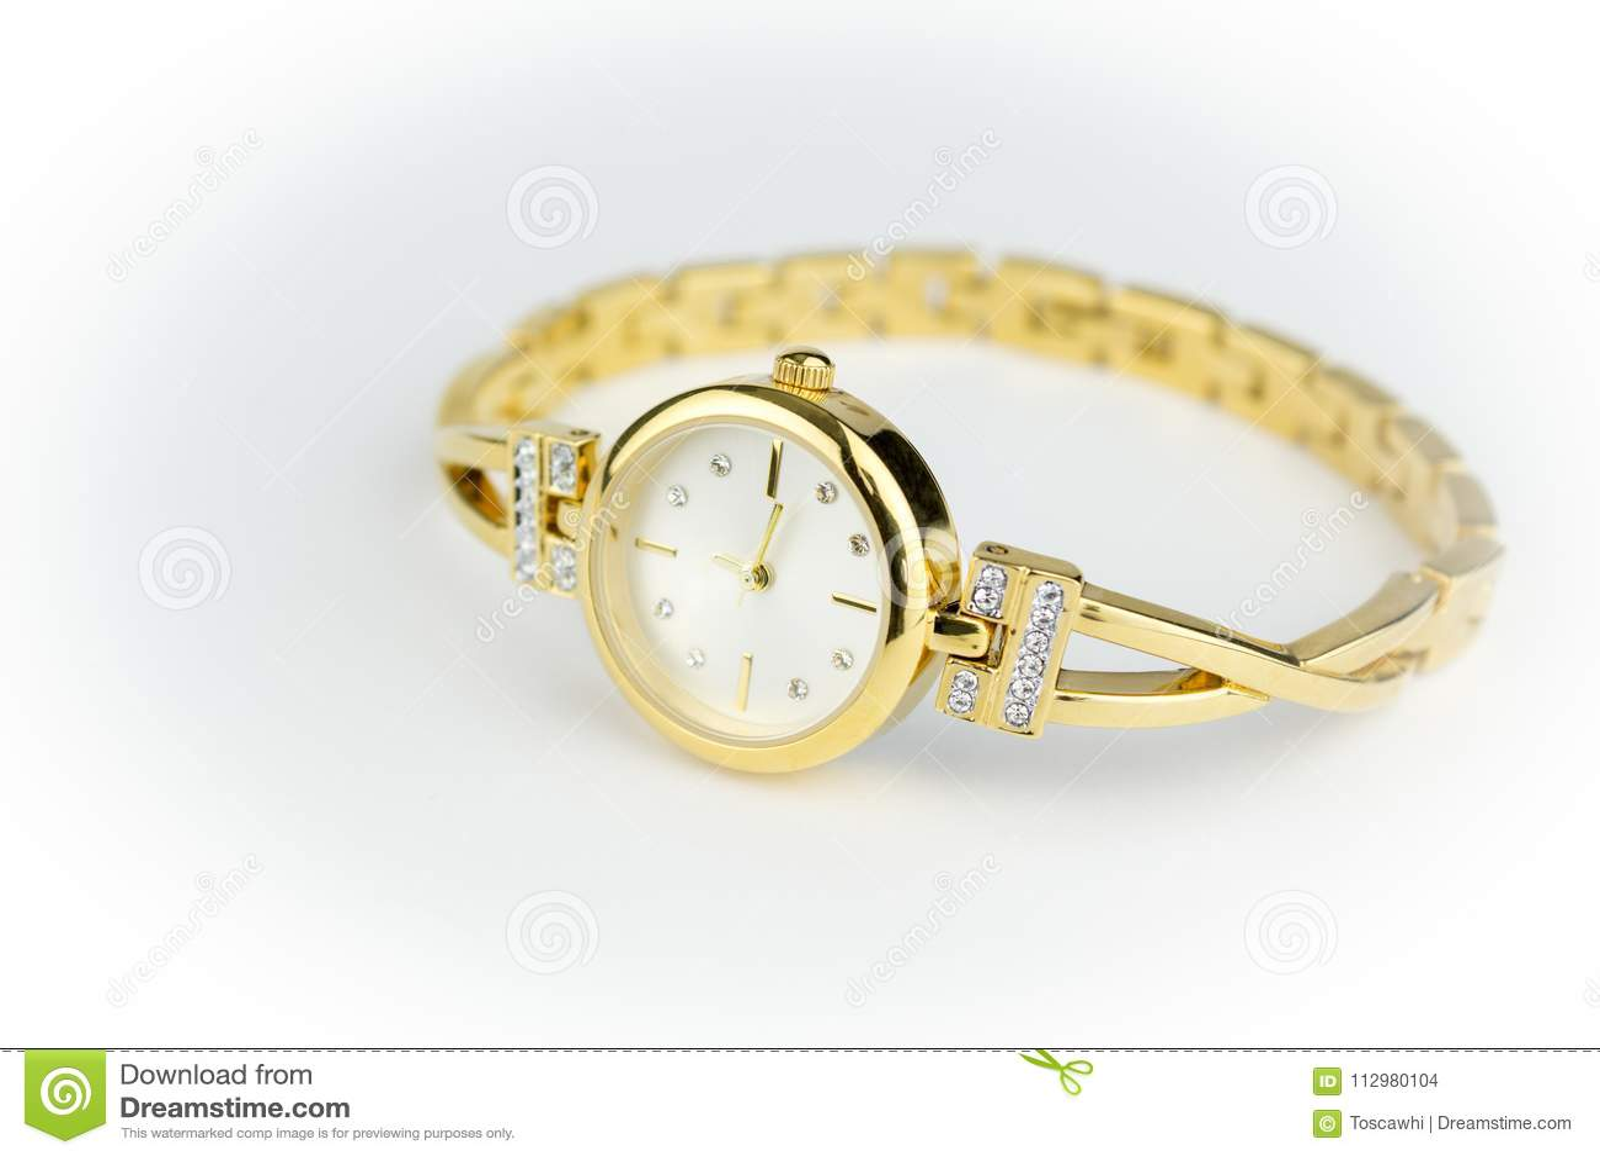 1d13fcdfcb4 Γυναικείο χρυσό ρολόι με τα διαμάντια που απομονώνονται στο άσπρο ...